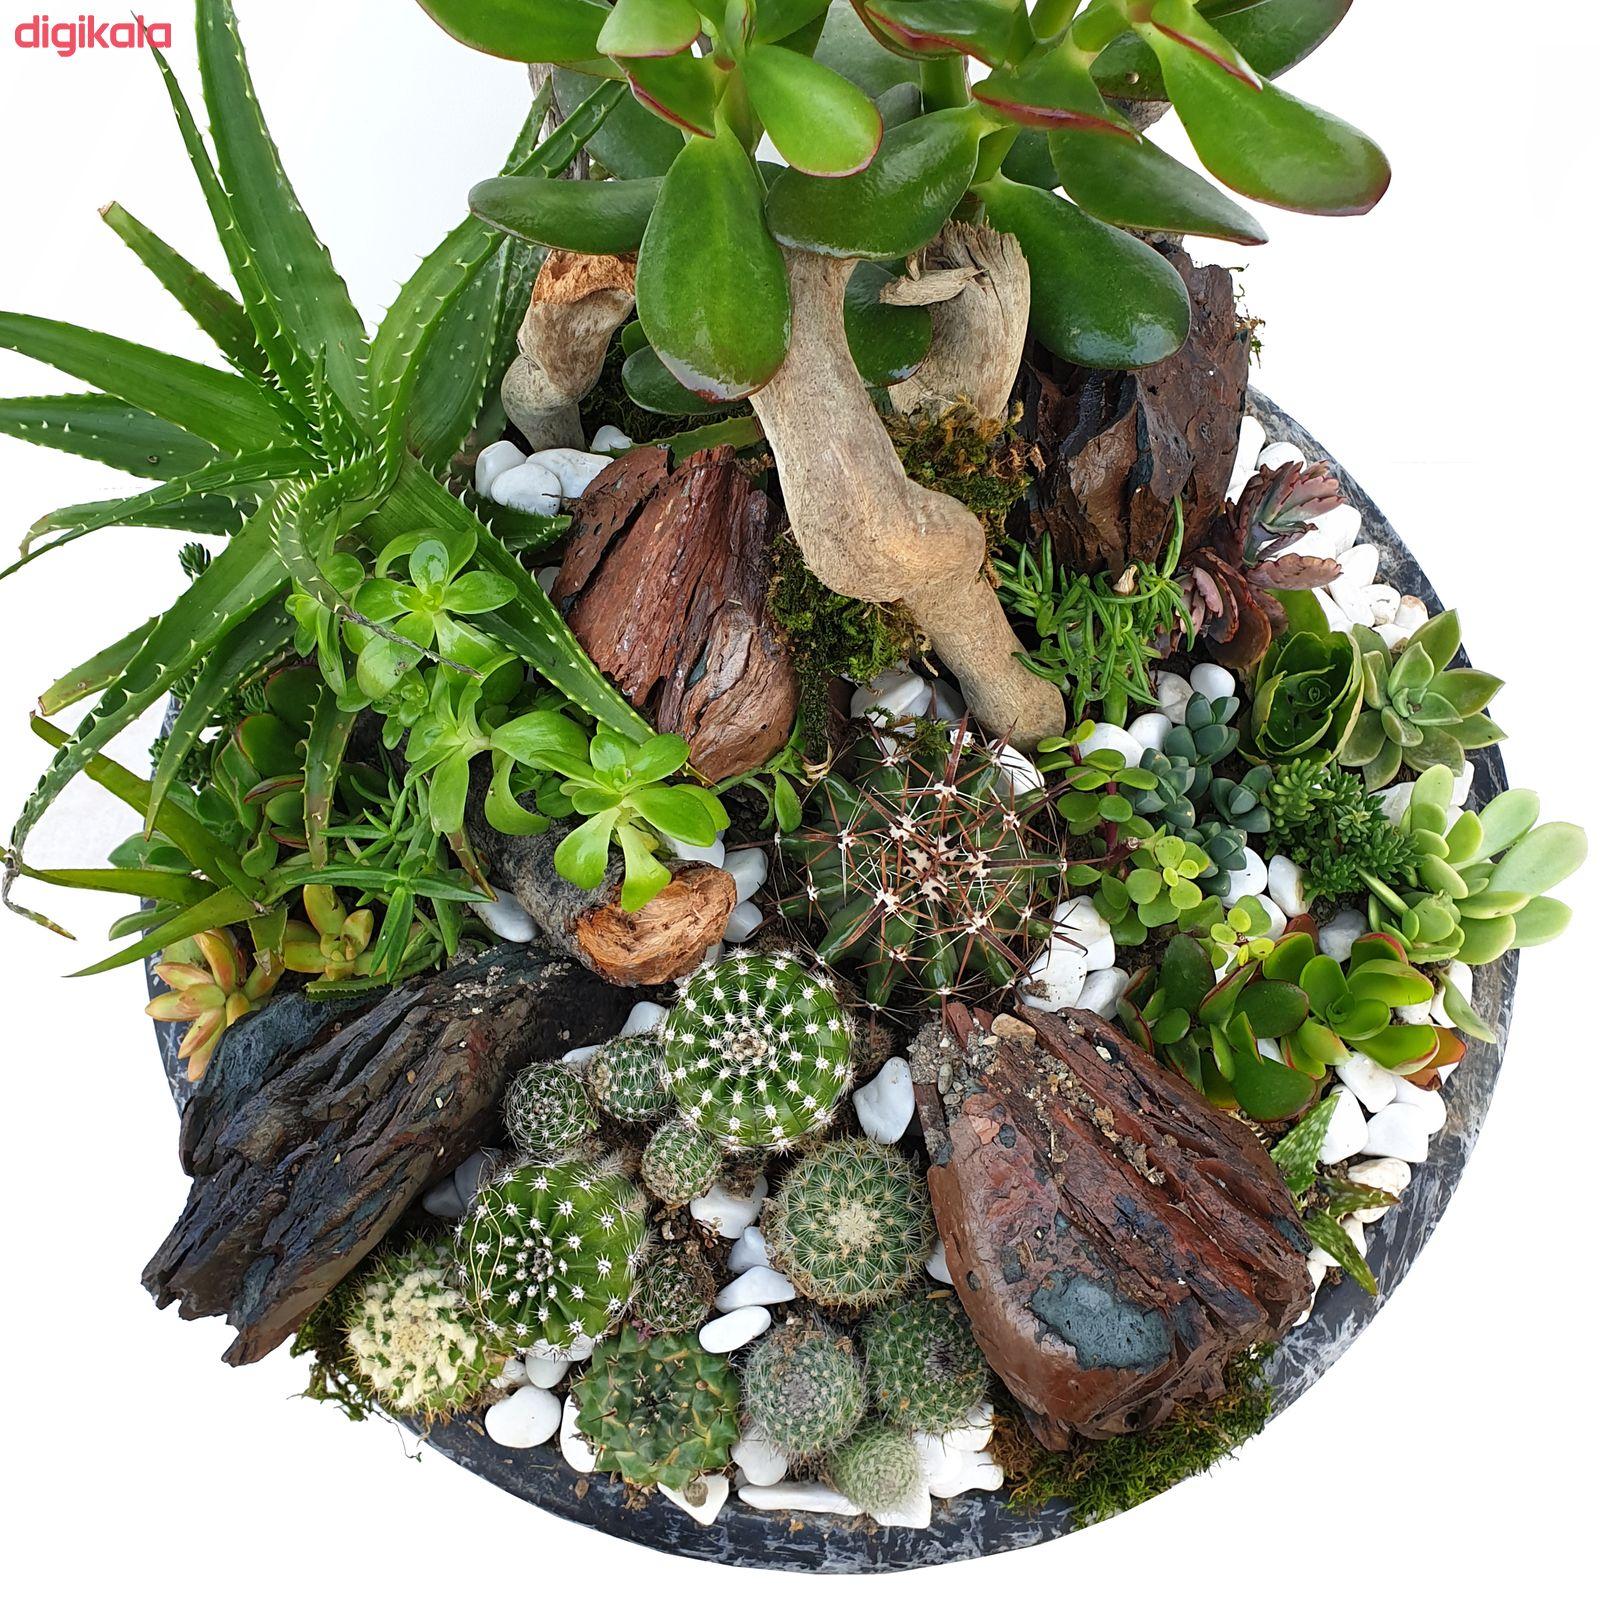 گیاه طبیعی کاکتوس مدل MK-99006 main 1 1